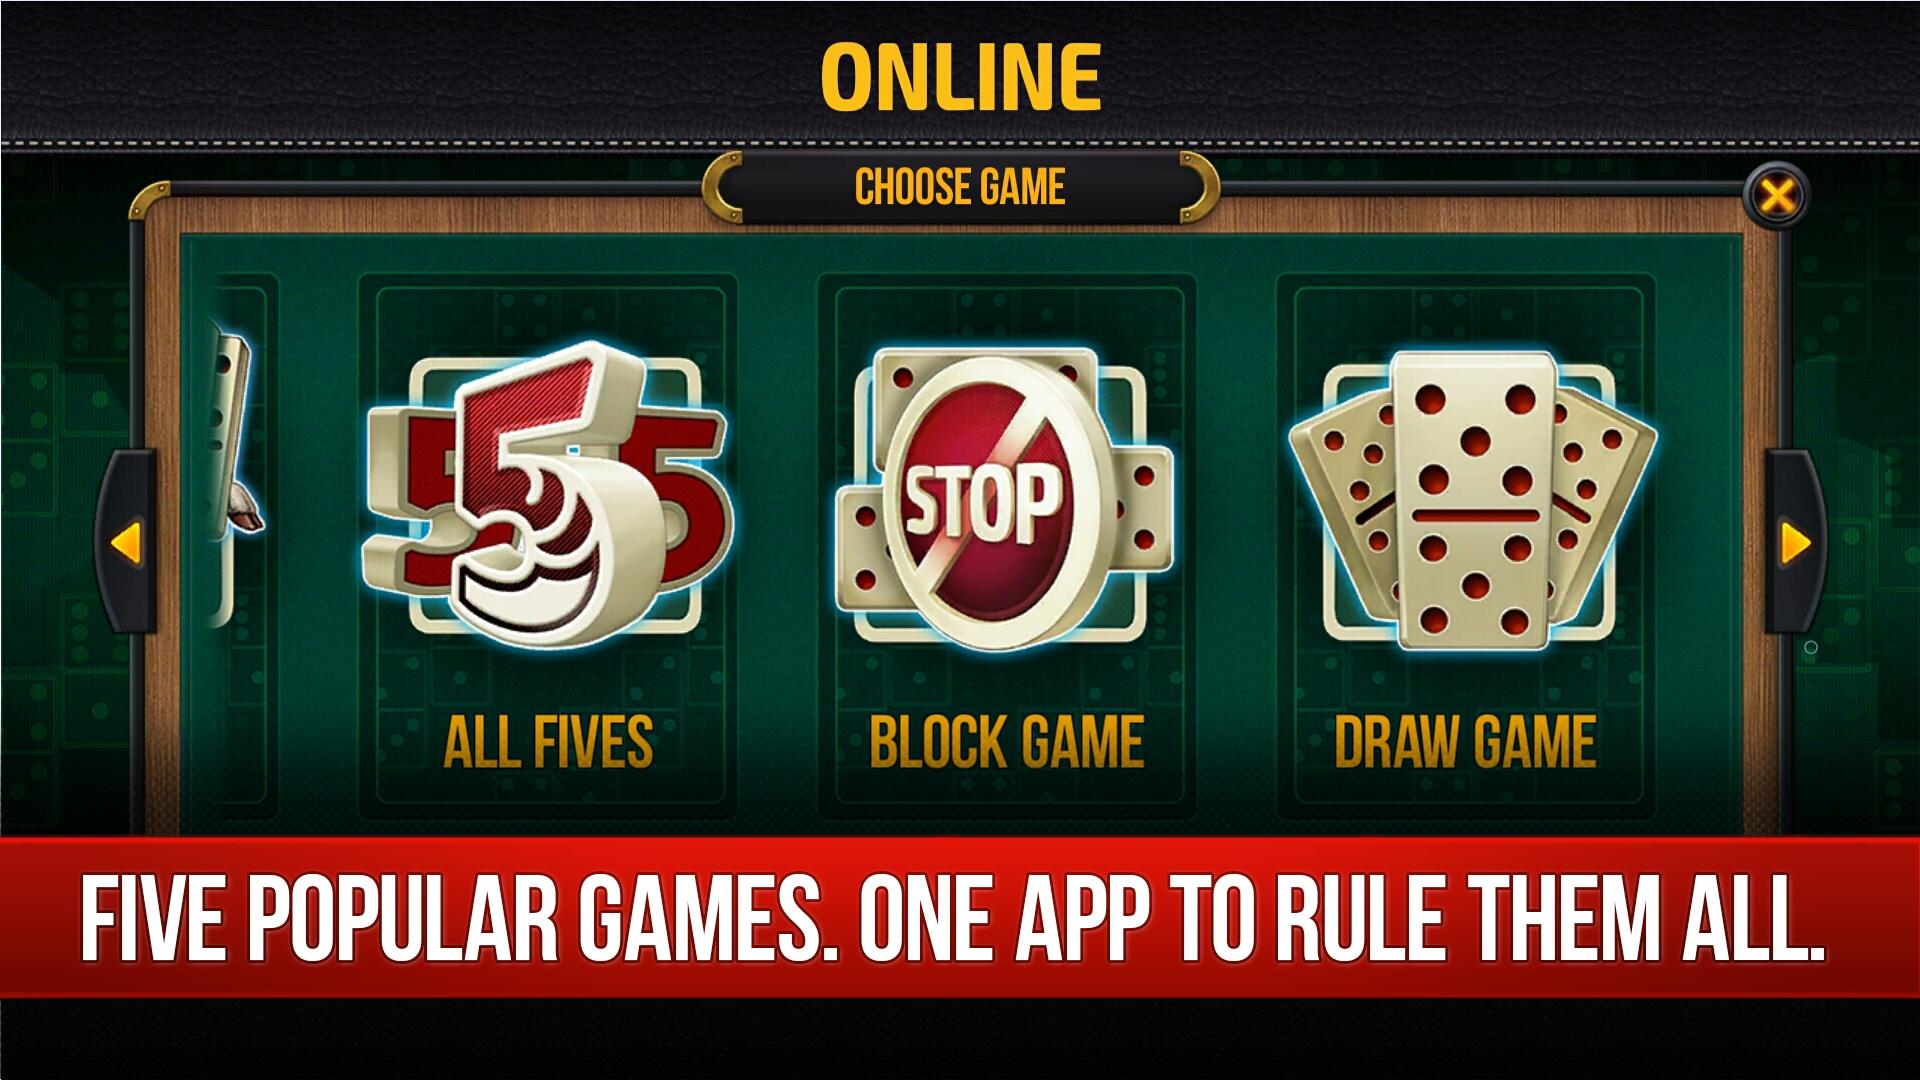 Domino - Dominoes online. Play free Dominos! 2.9.2 Screenshot 12